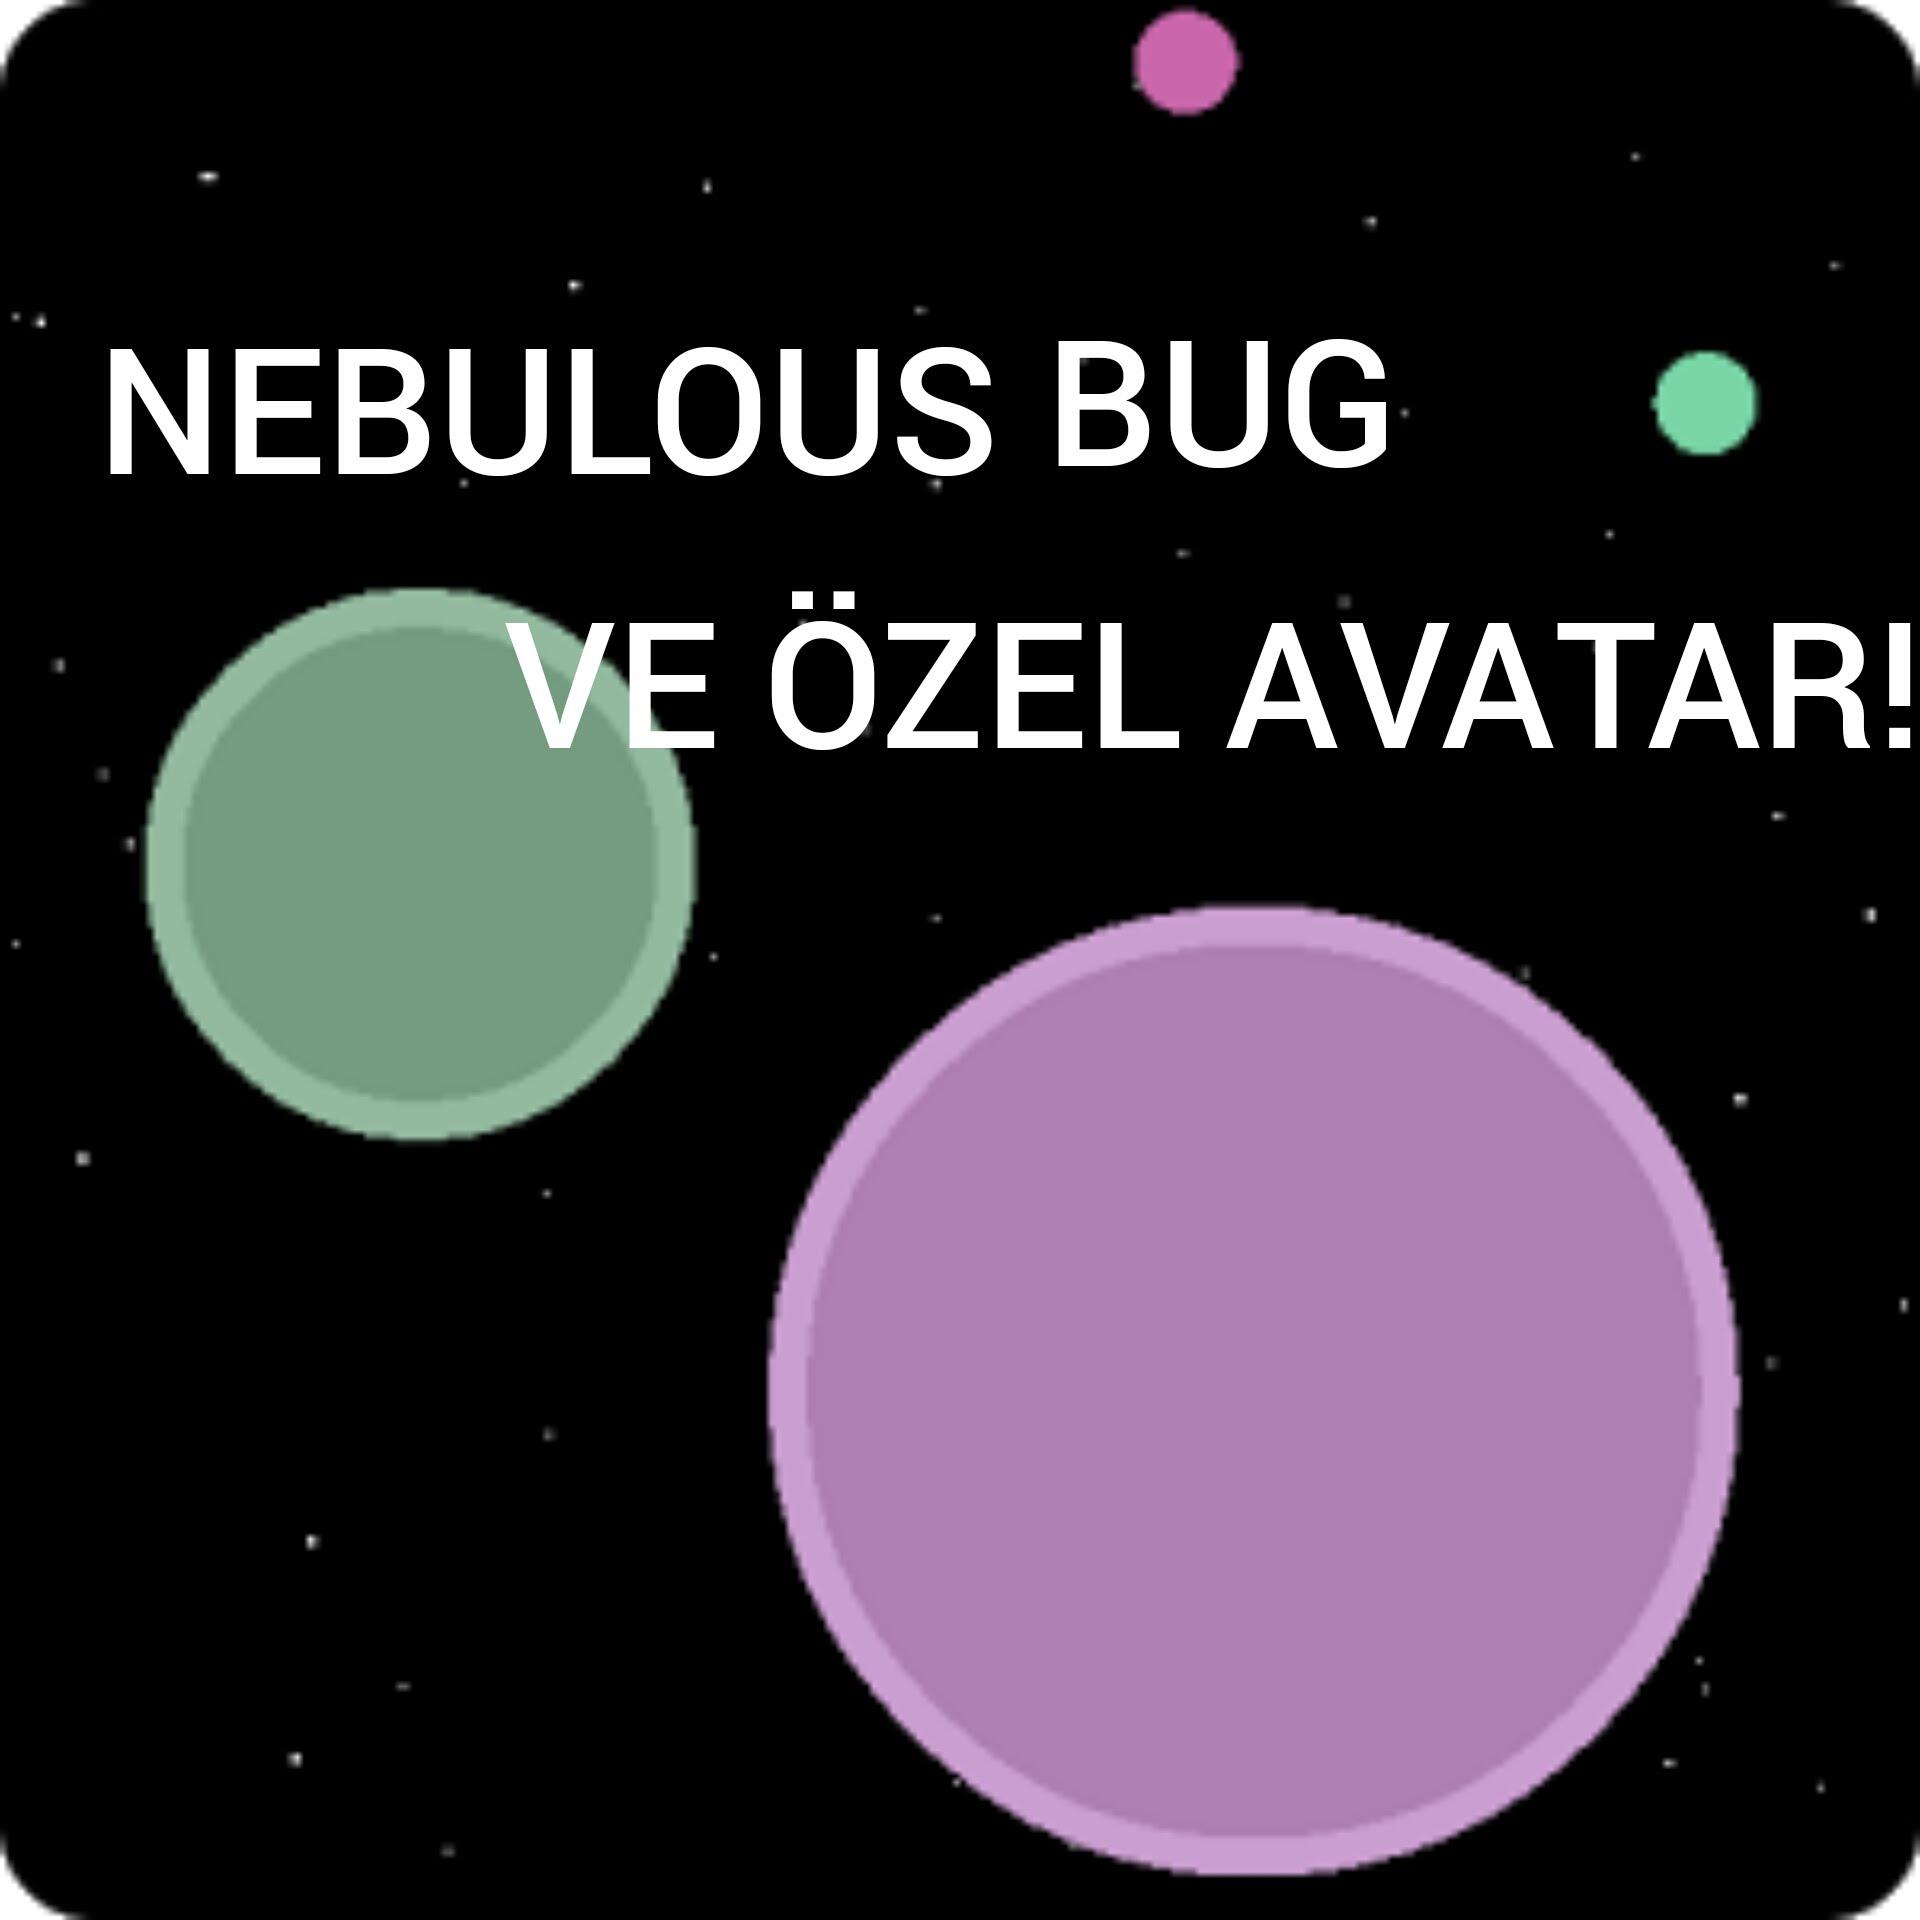 Nebulous clipart #4